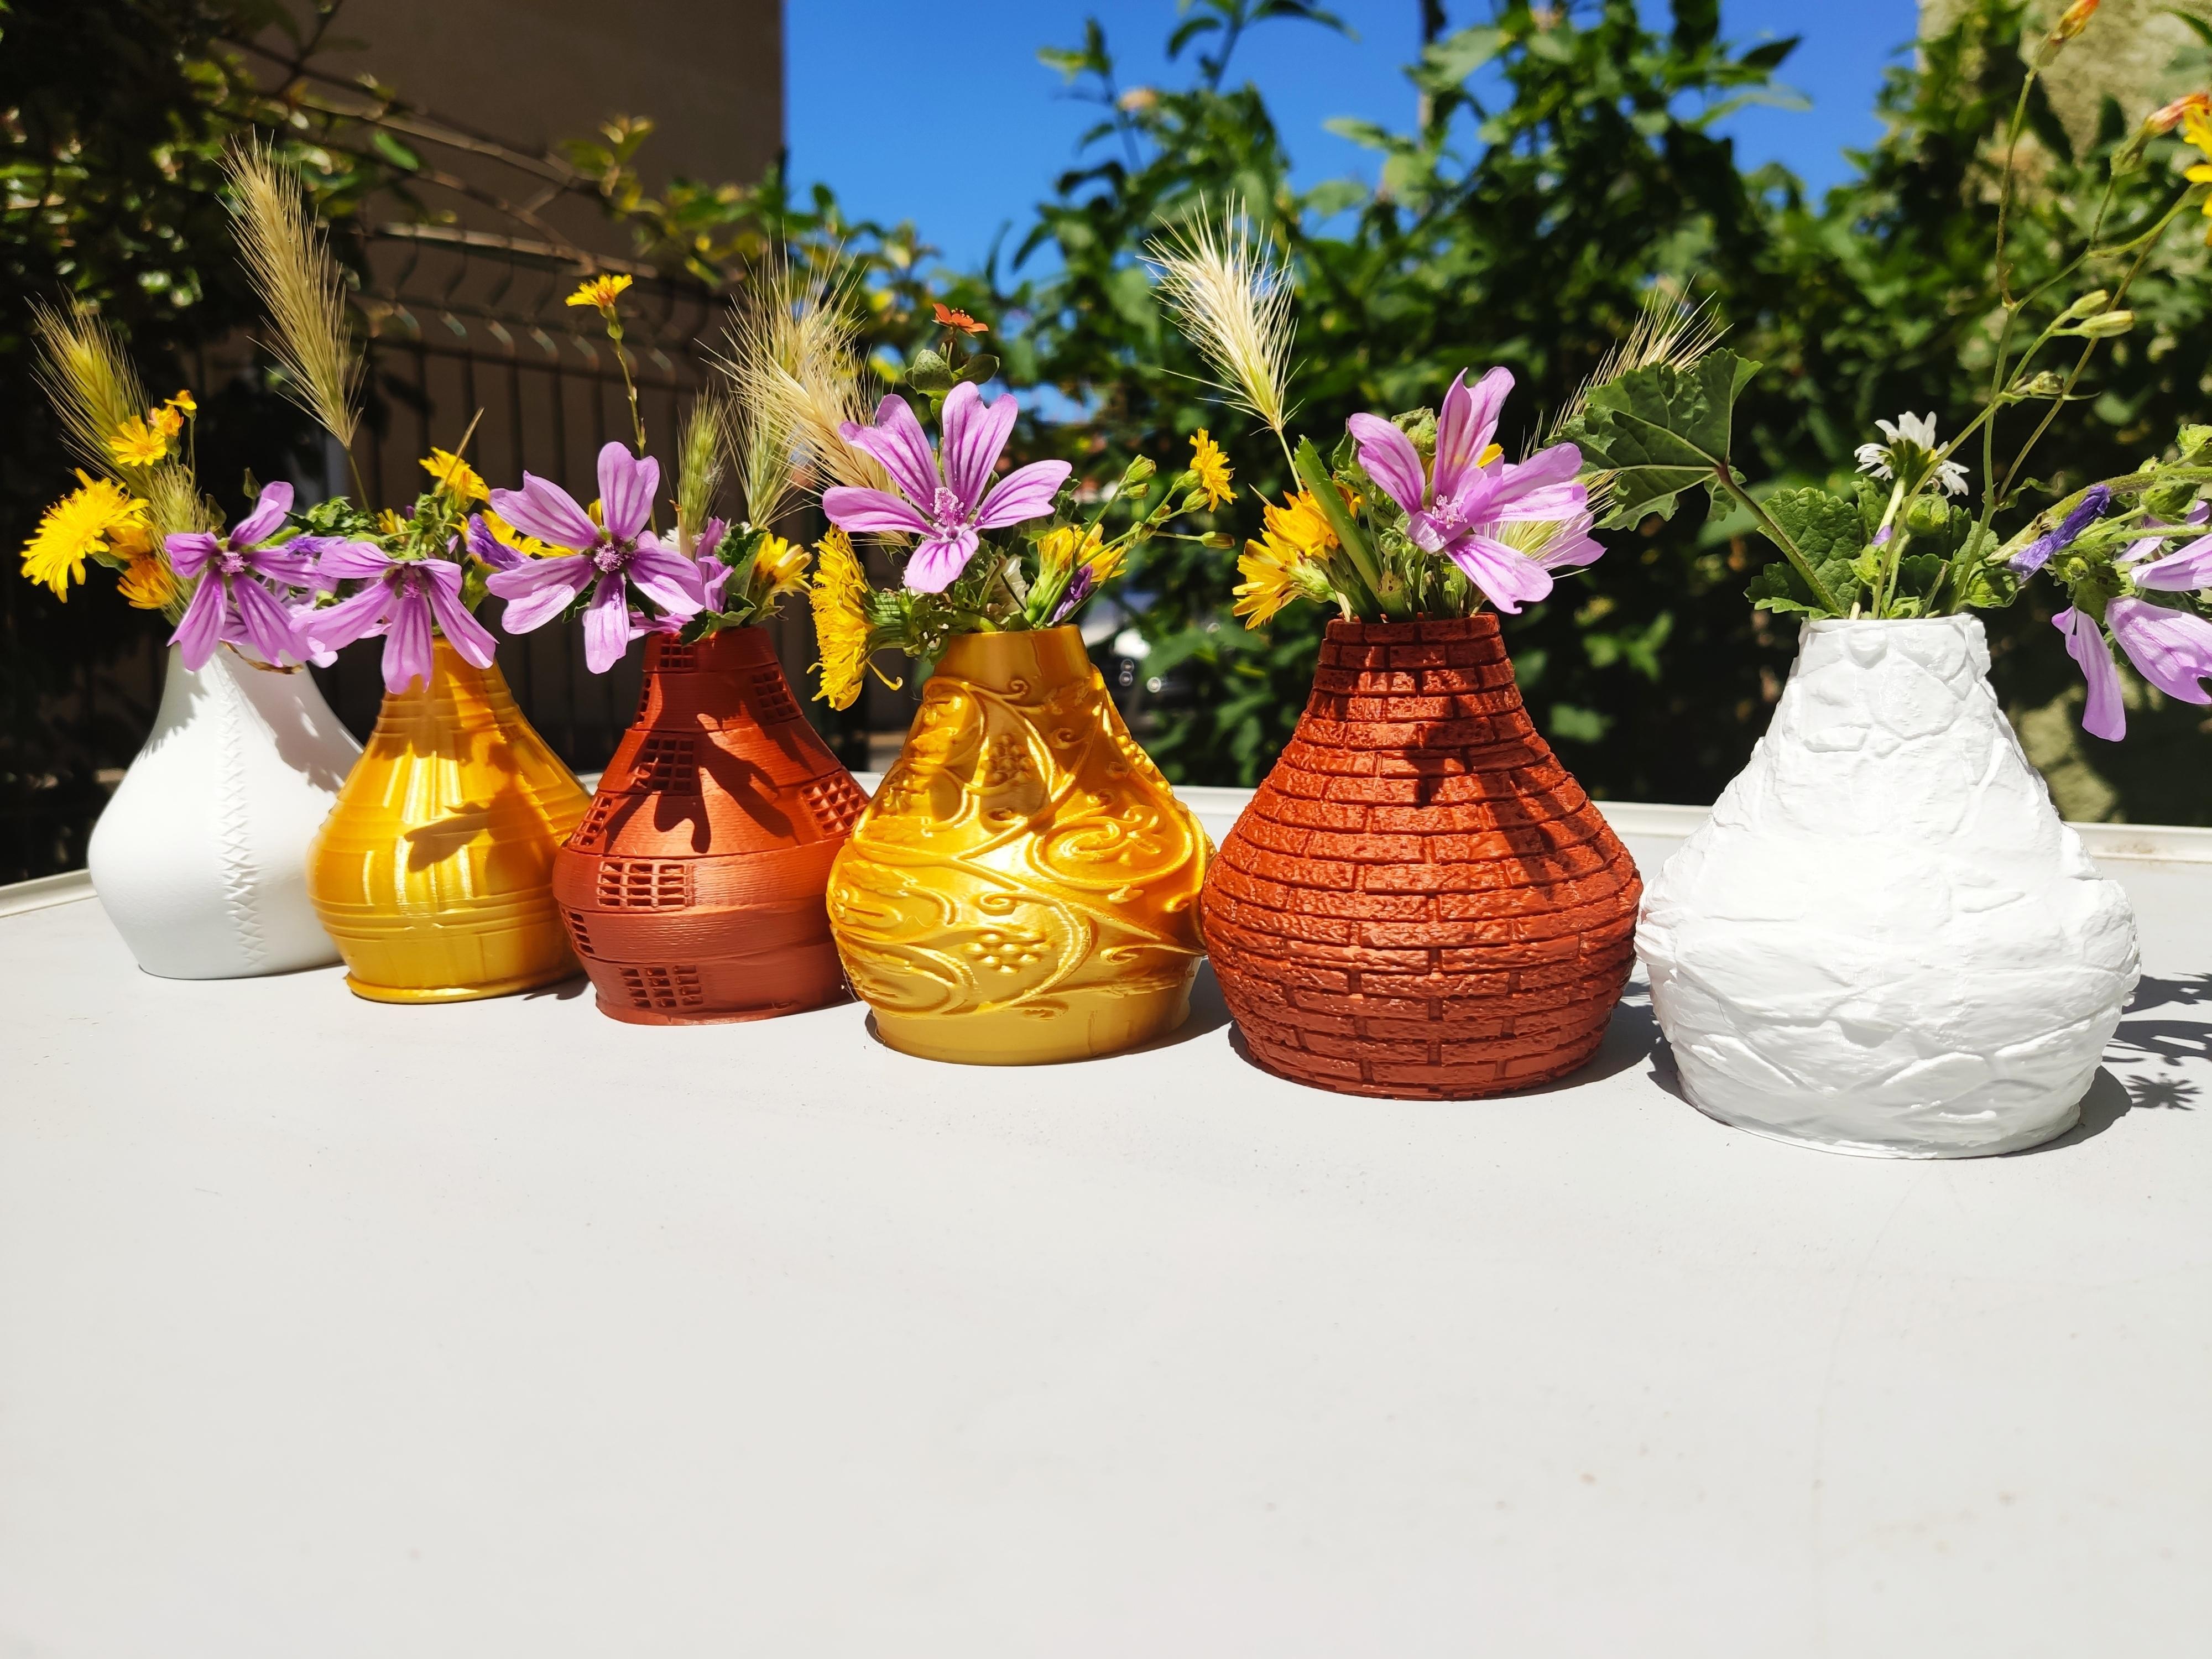 IMG_20200630_152316.jpg Télécharger fichier STL X86 Mini vase collection  • Objet imprimable en 3D, motek